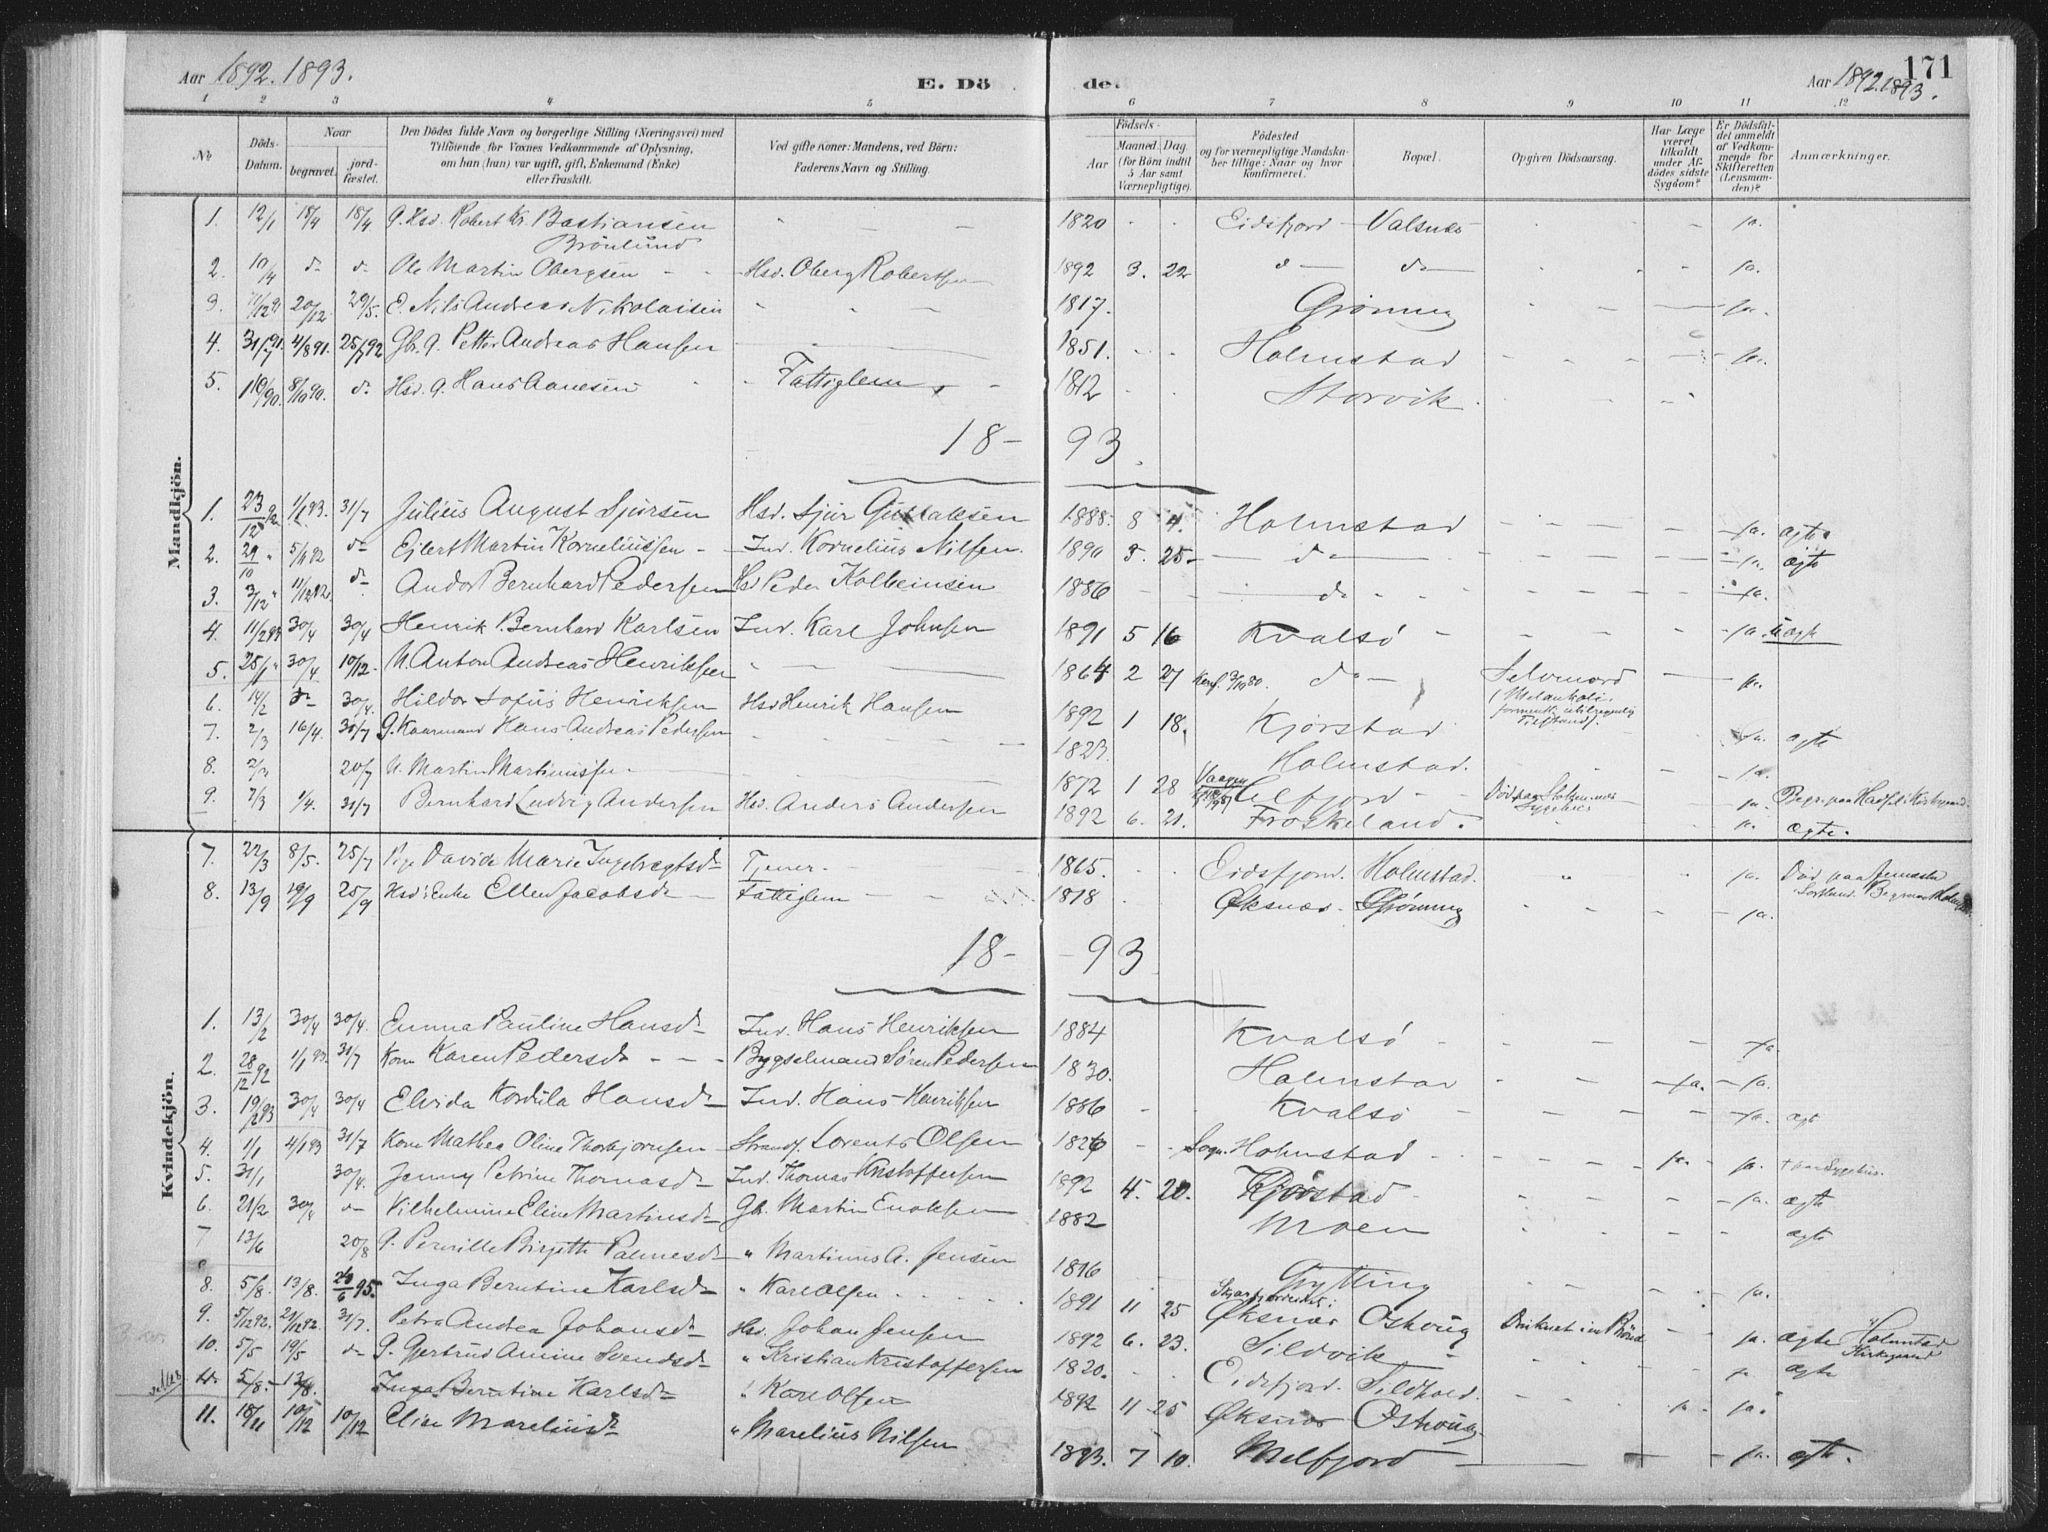 SAT, Ministerialprotokoller, klokkerbøker og fødselsregistre - Nordland, 890/L1286: Ministerialbok nr. 890A01, 1882-1902, s. 171